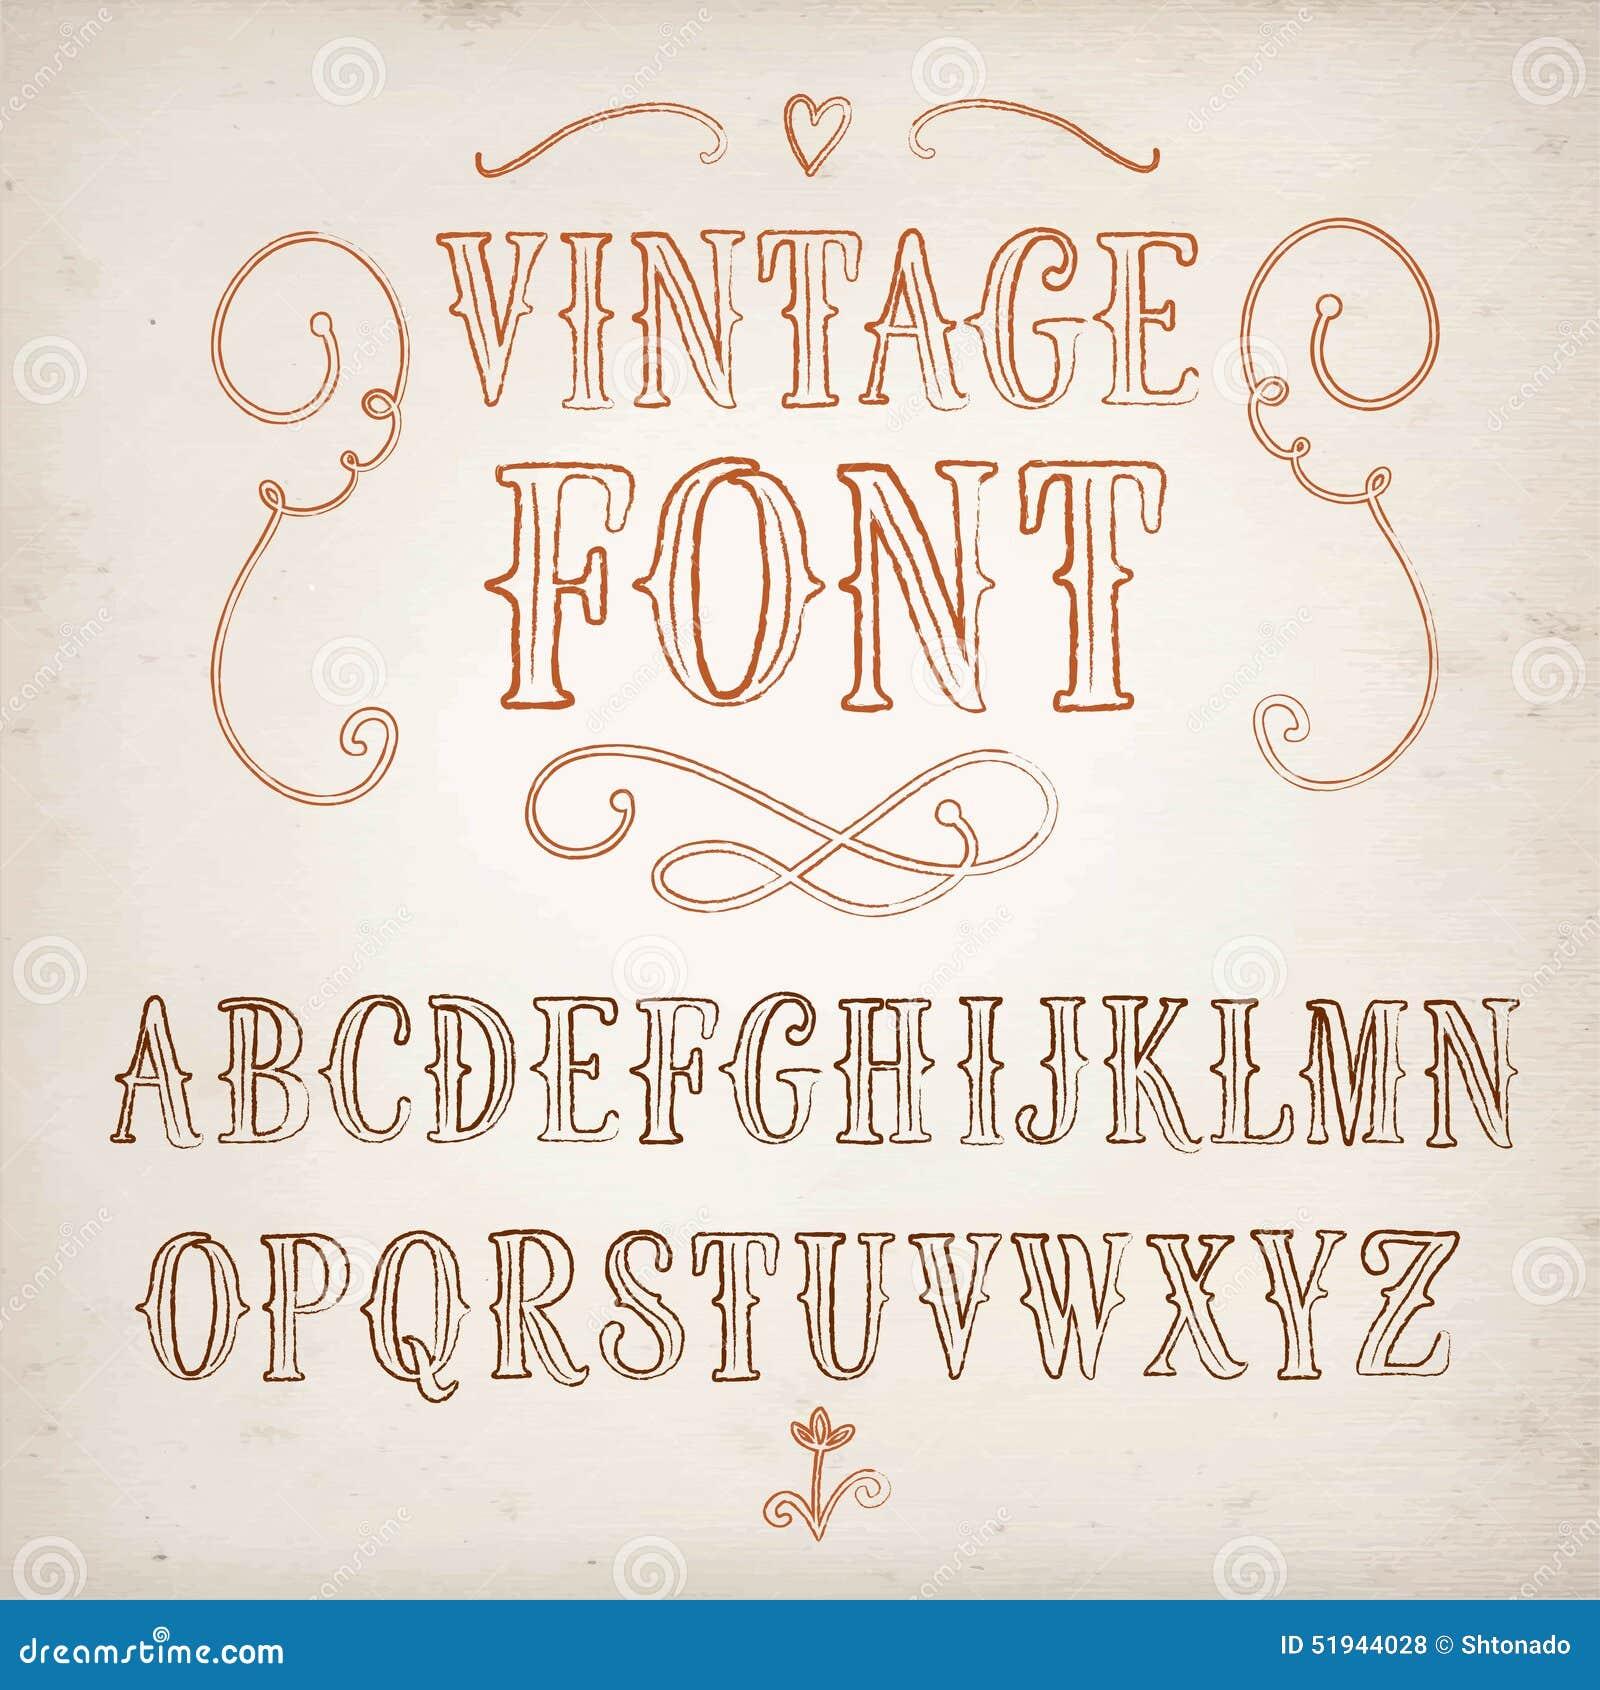 Custom written paper by handwritten font